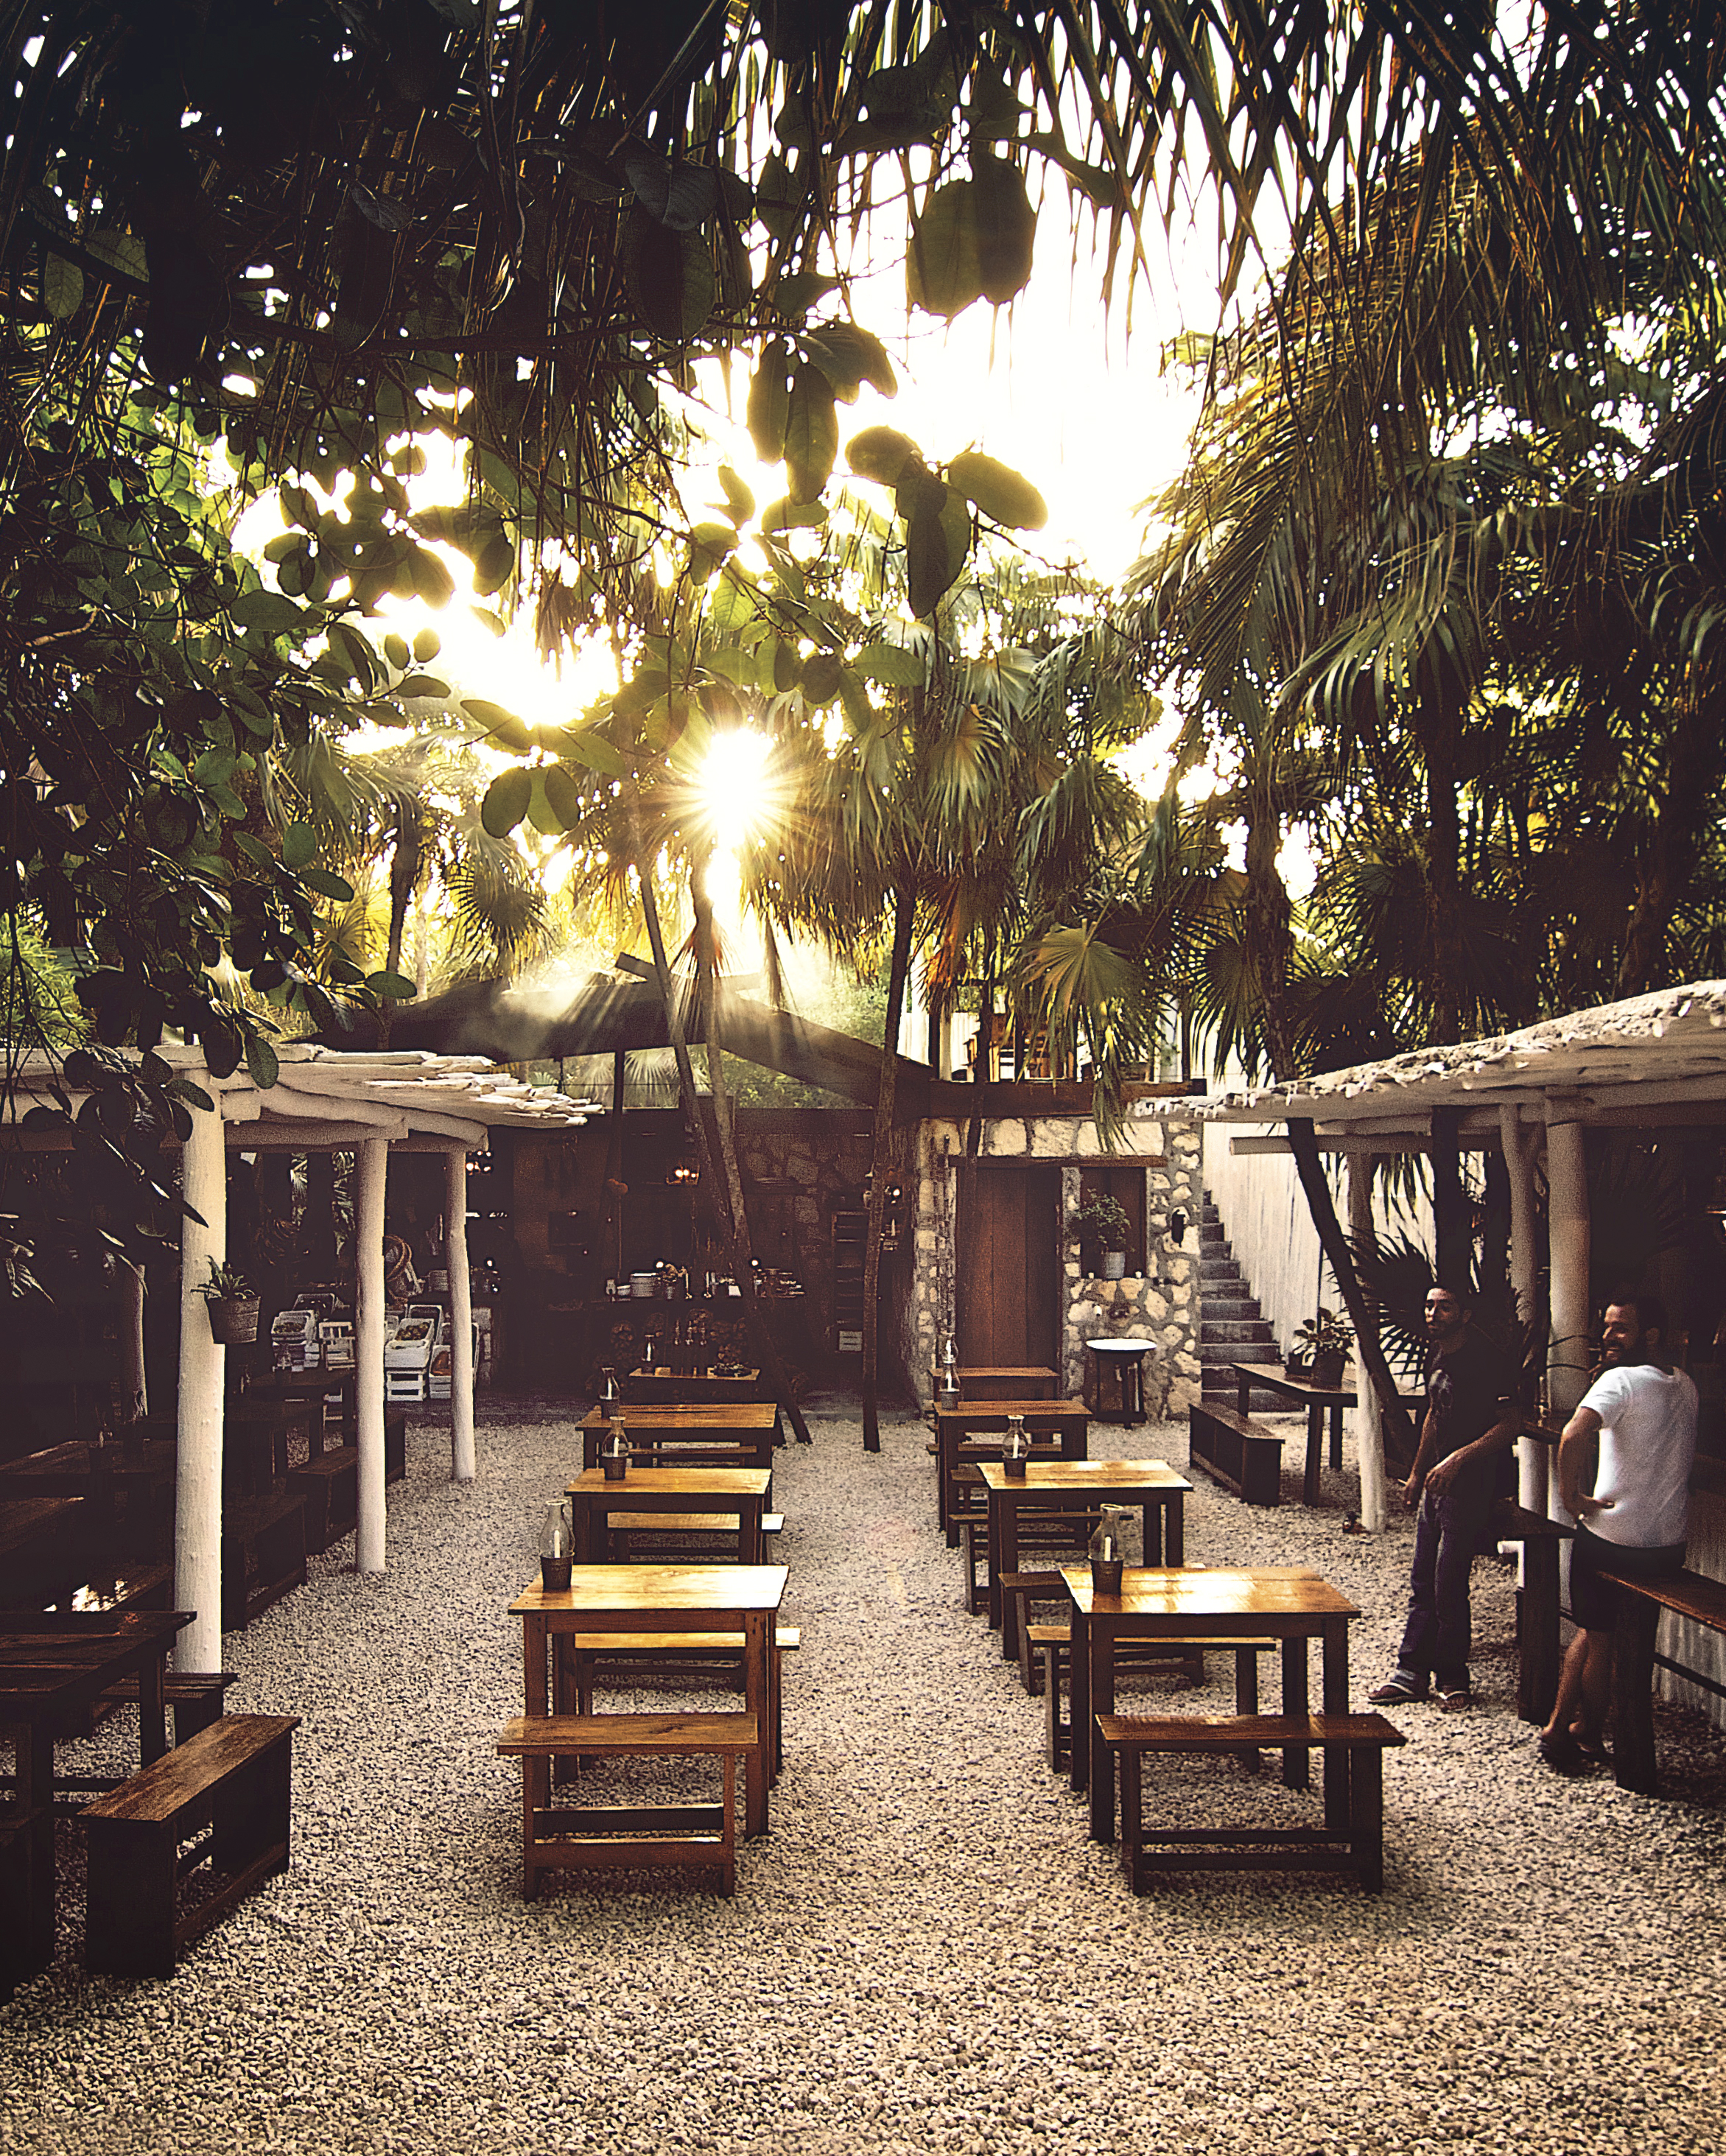 outdoor-bar-img-3195-s112019.jpg